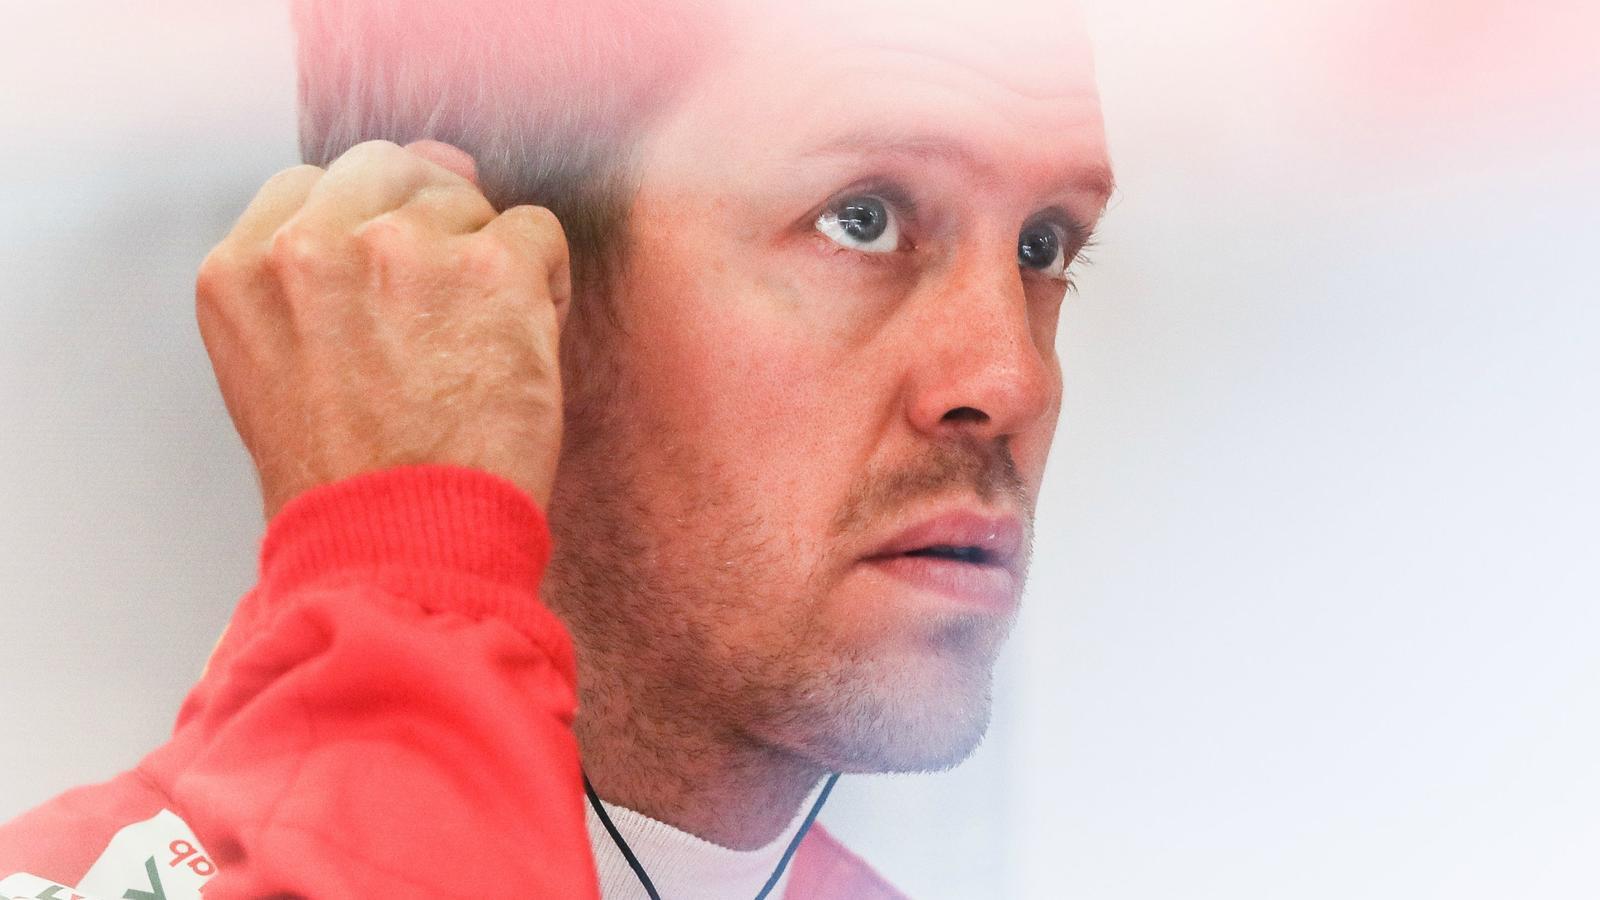 Zur Defensive verdammt: Sebastian Vettel steht unter besonderer Beobachtung.